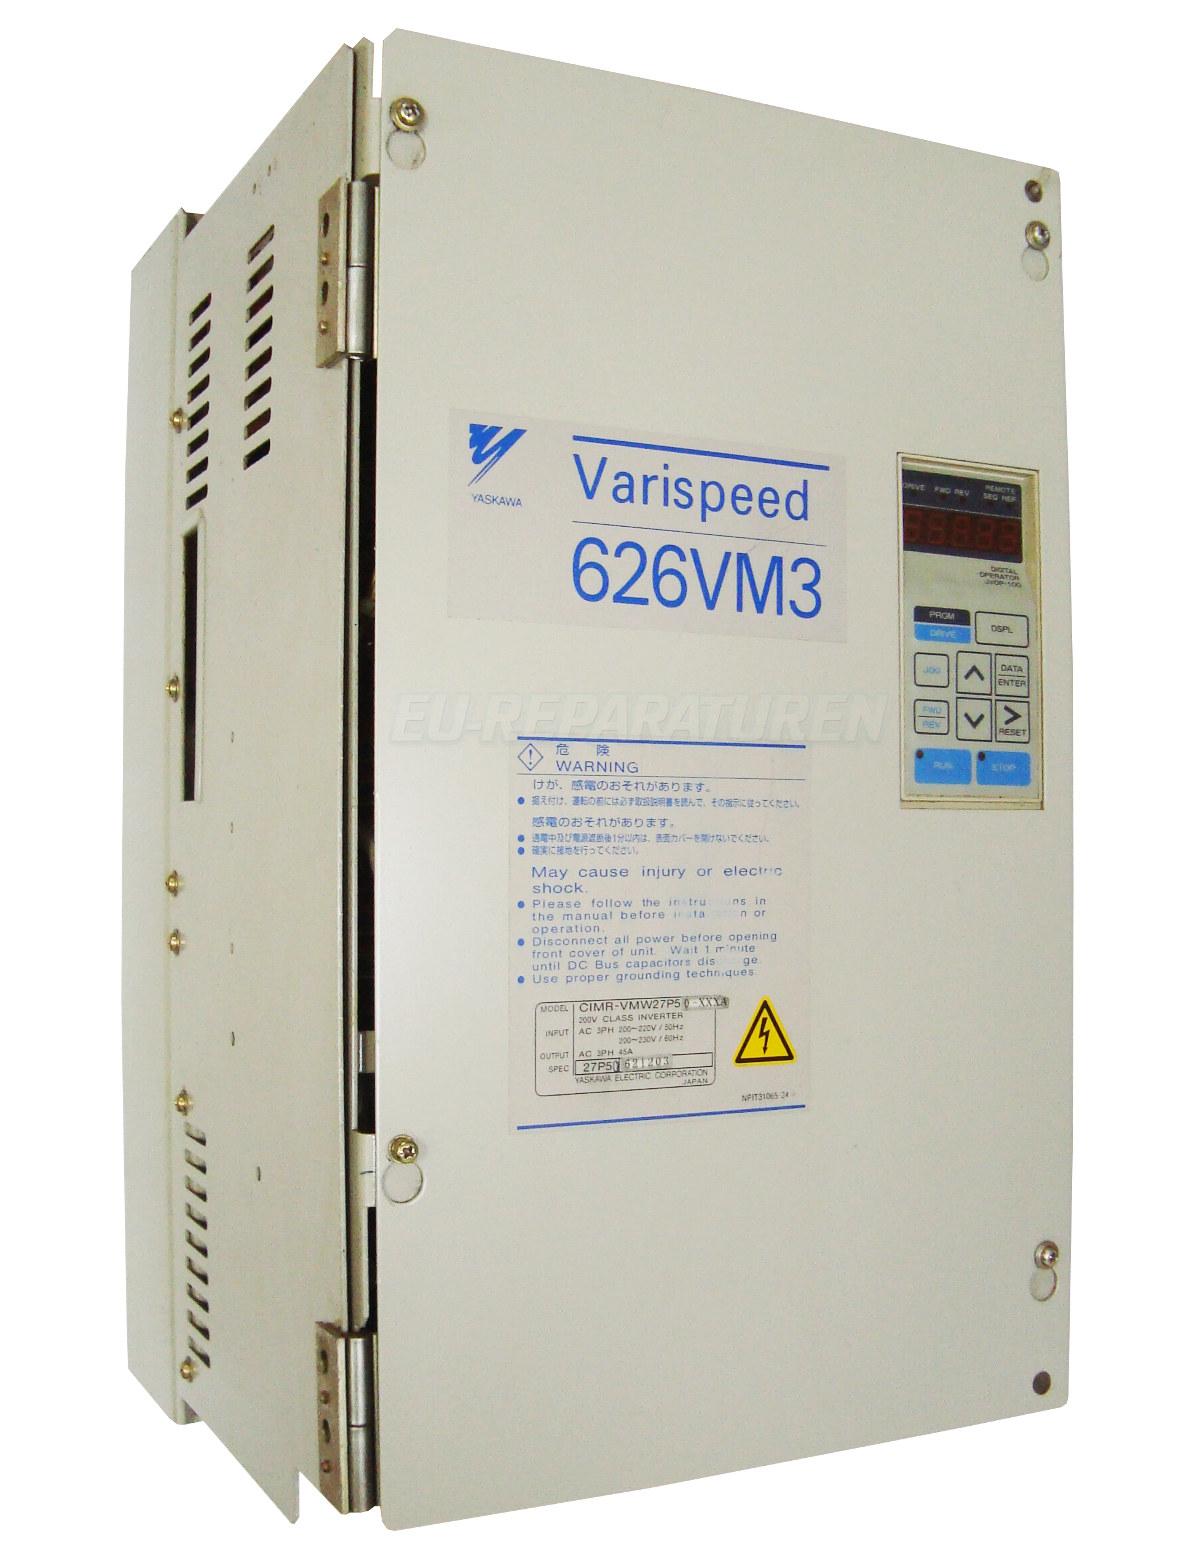 Reparatur Yaskawa CIMR-VMW27P50-XXXA AC DRIVE